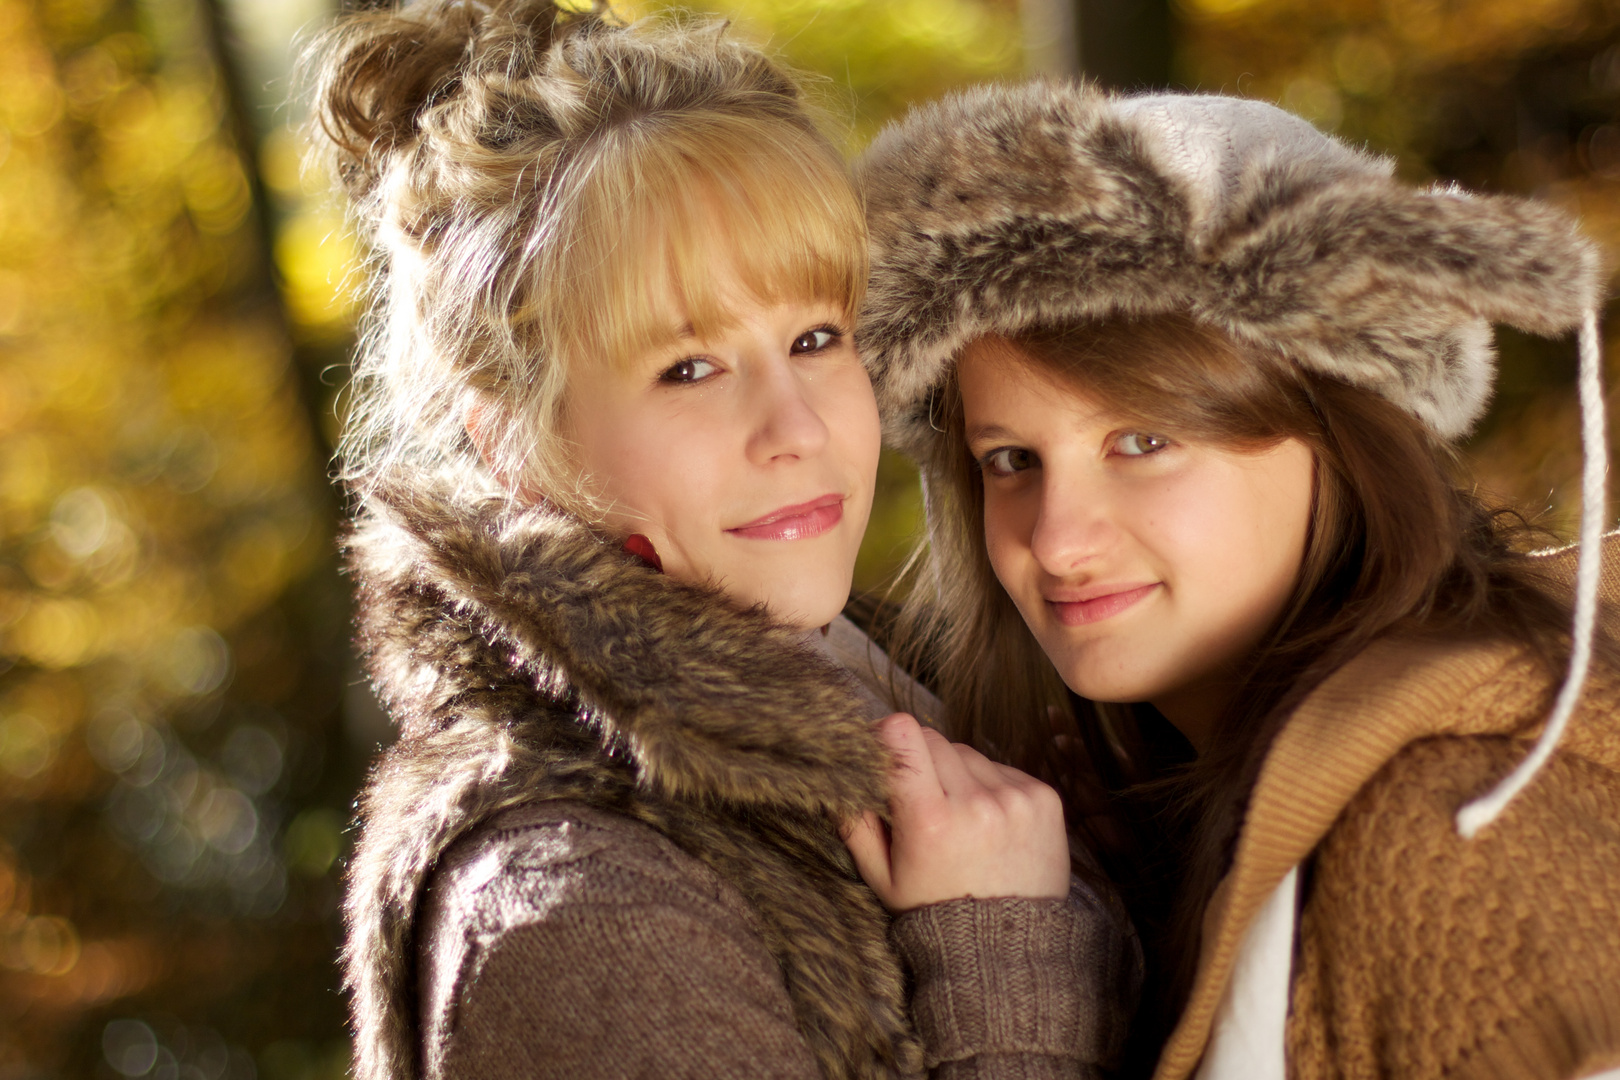 Laureen und Emilia in Farbe